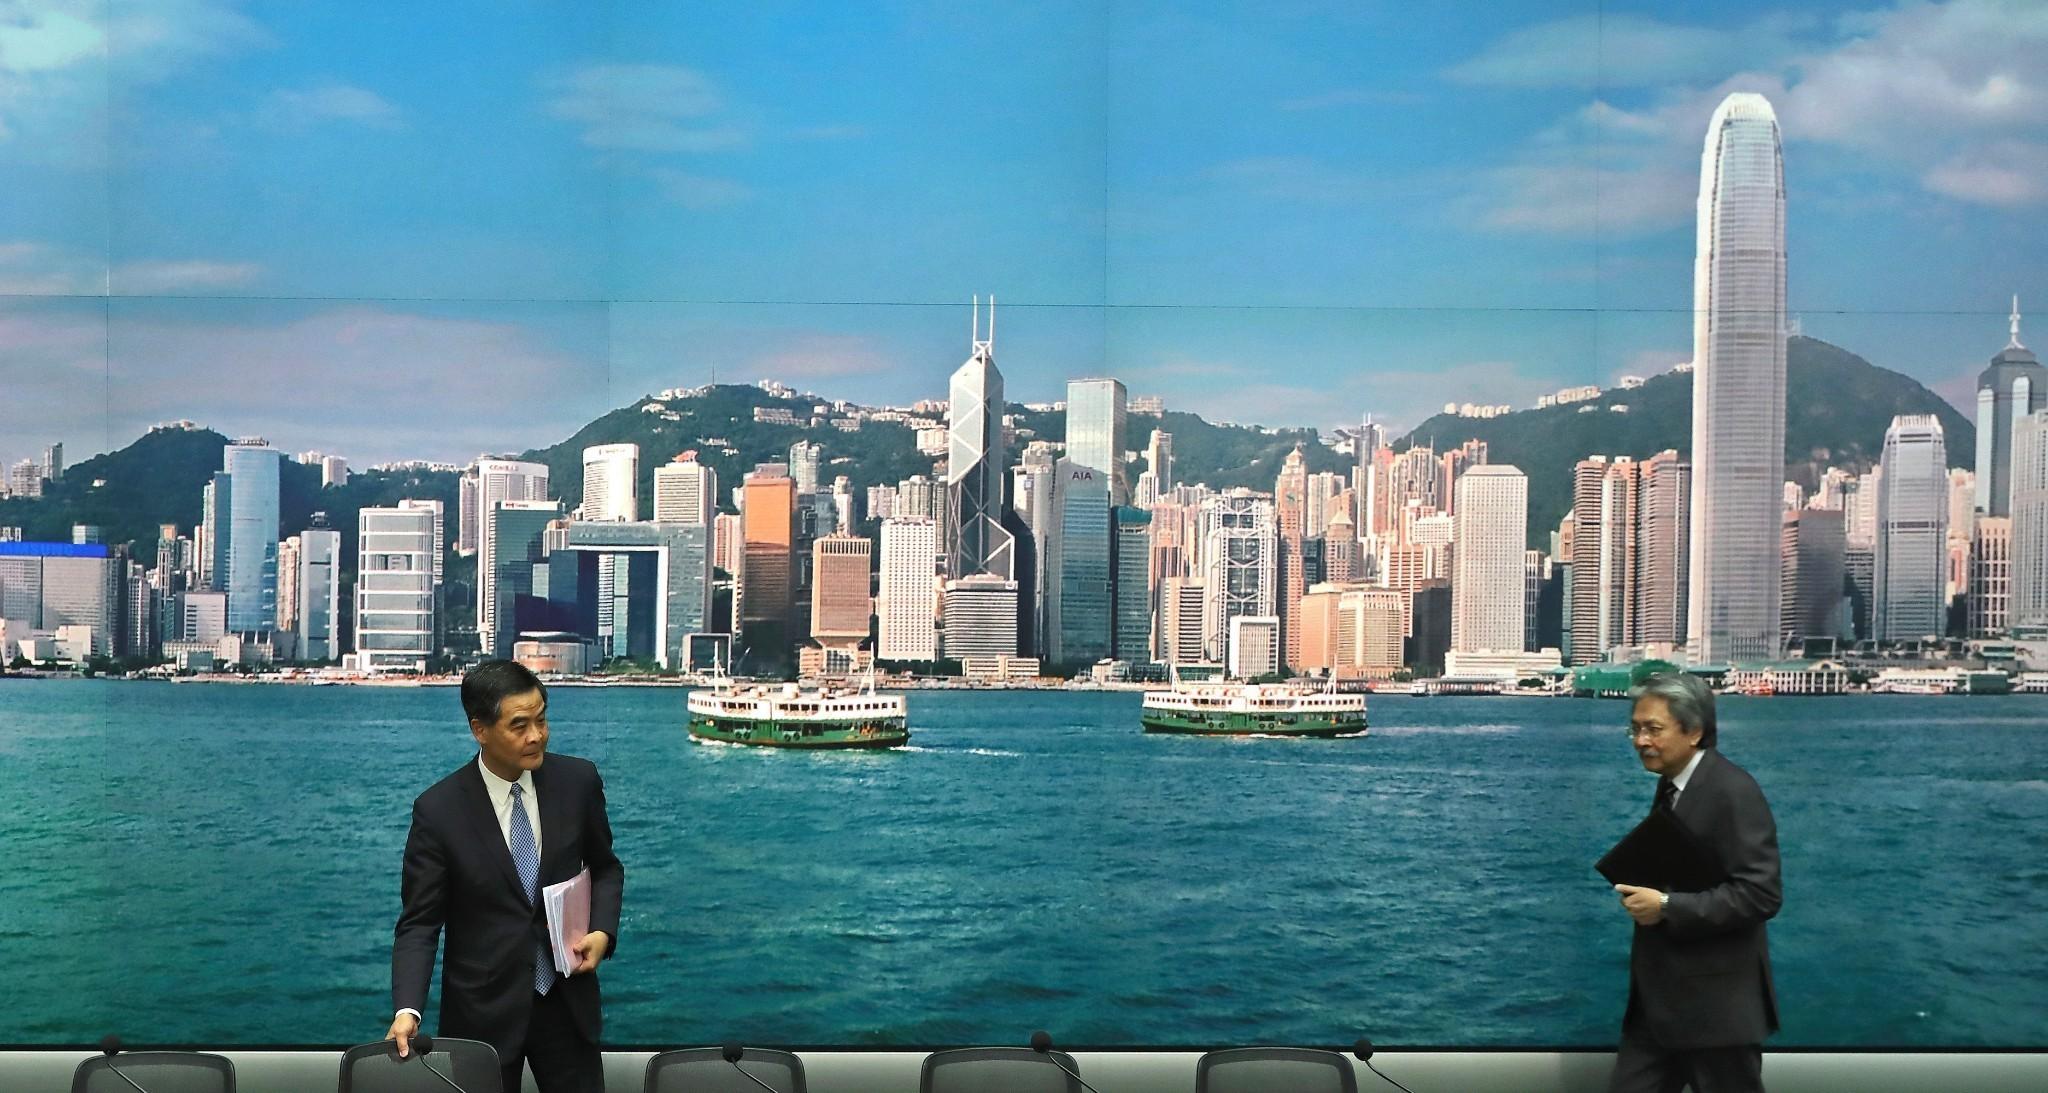 Hong Kong Wrestles With An Identity Crisis